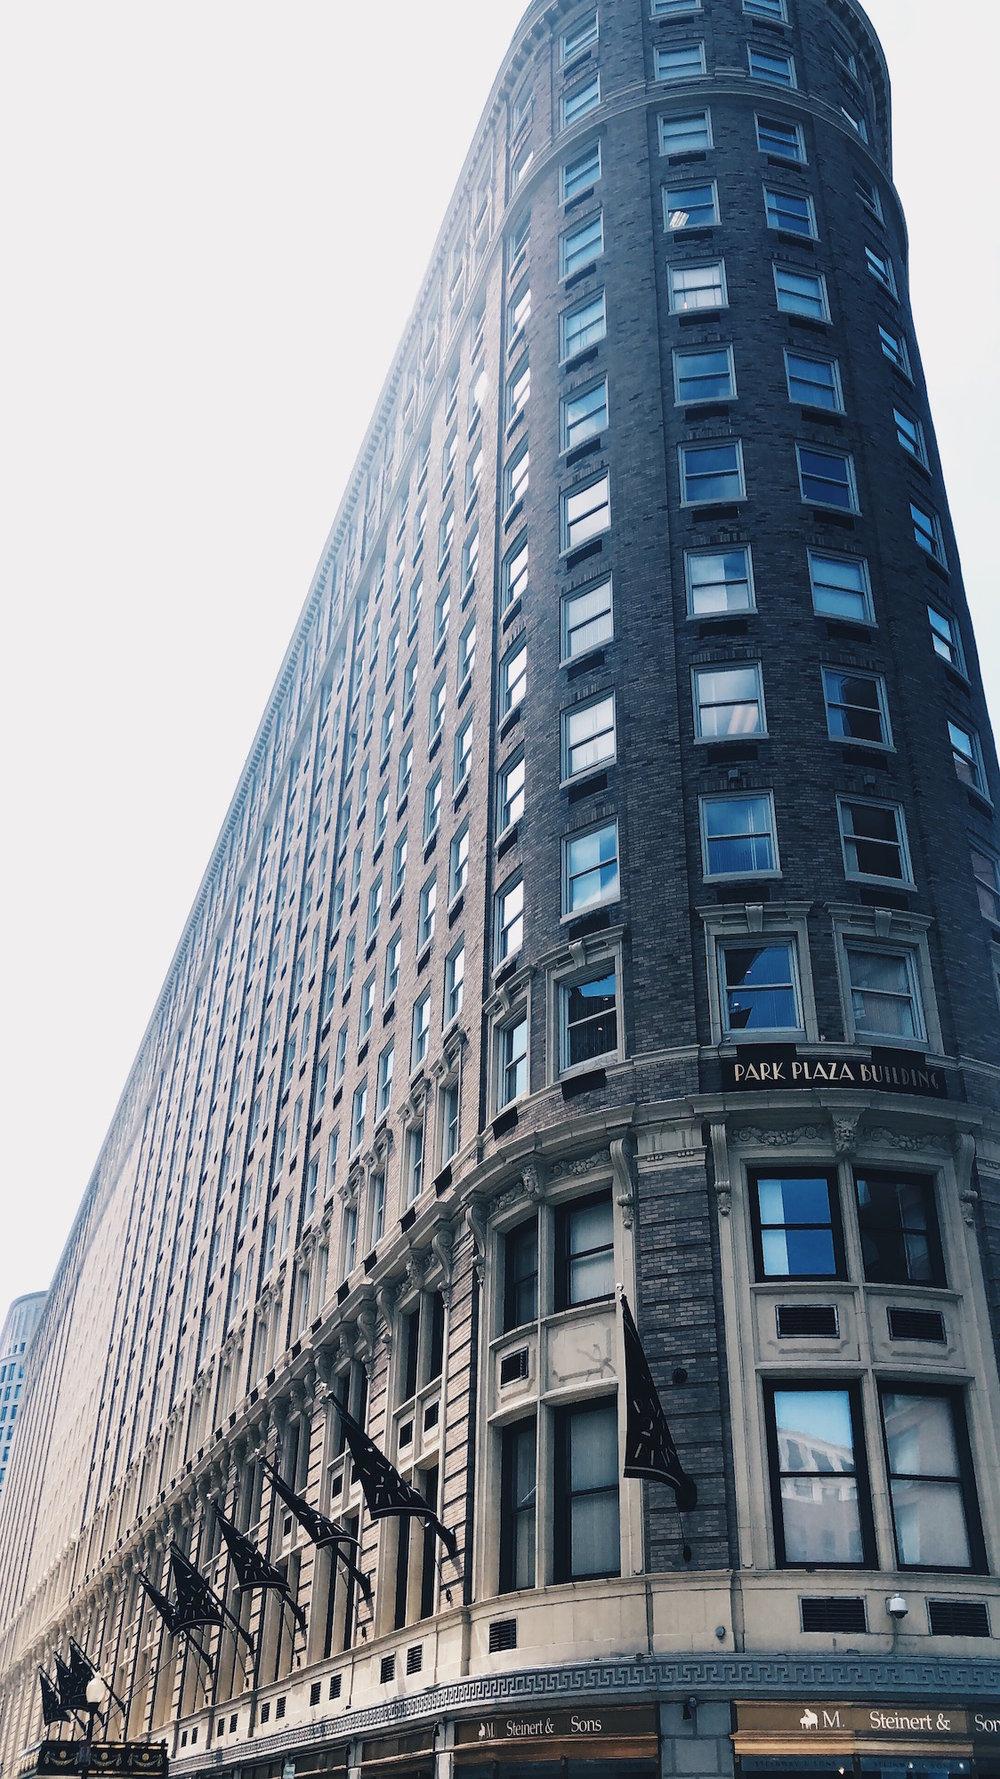 boston Park plaza building.jpg